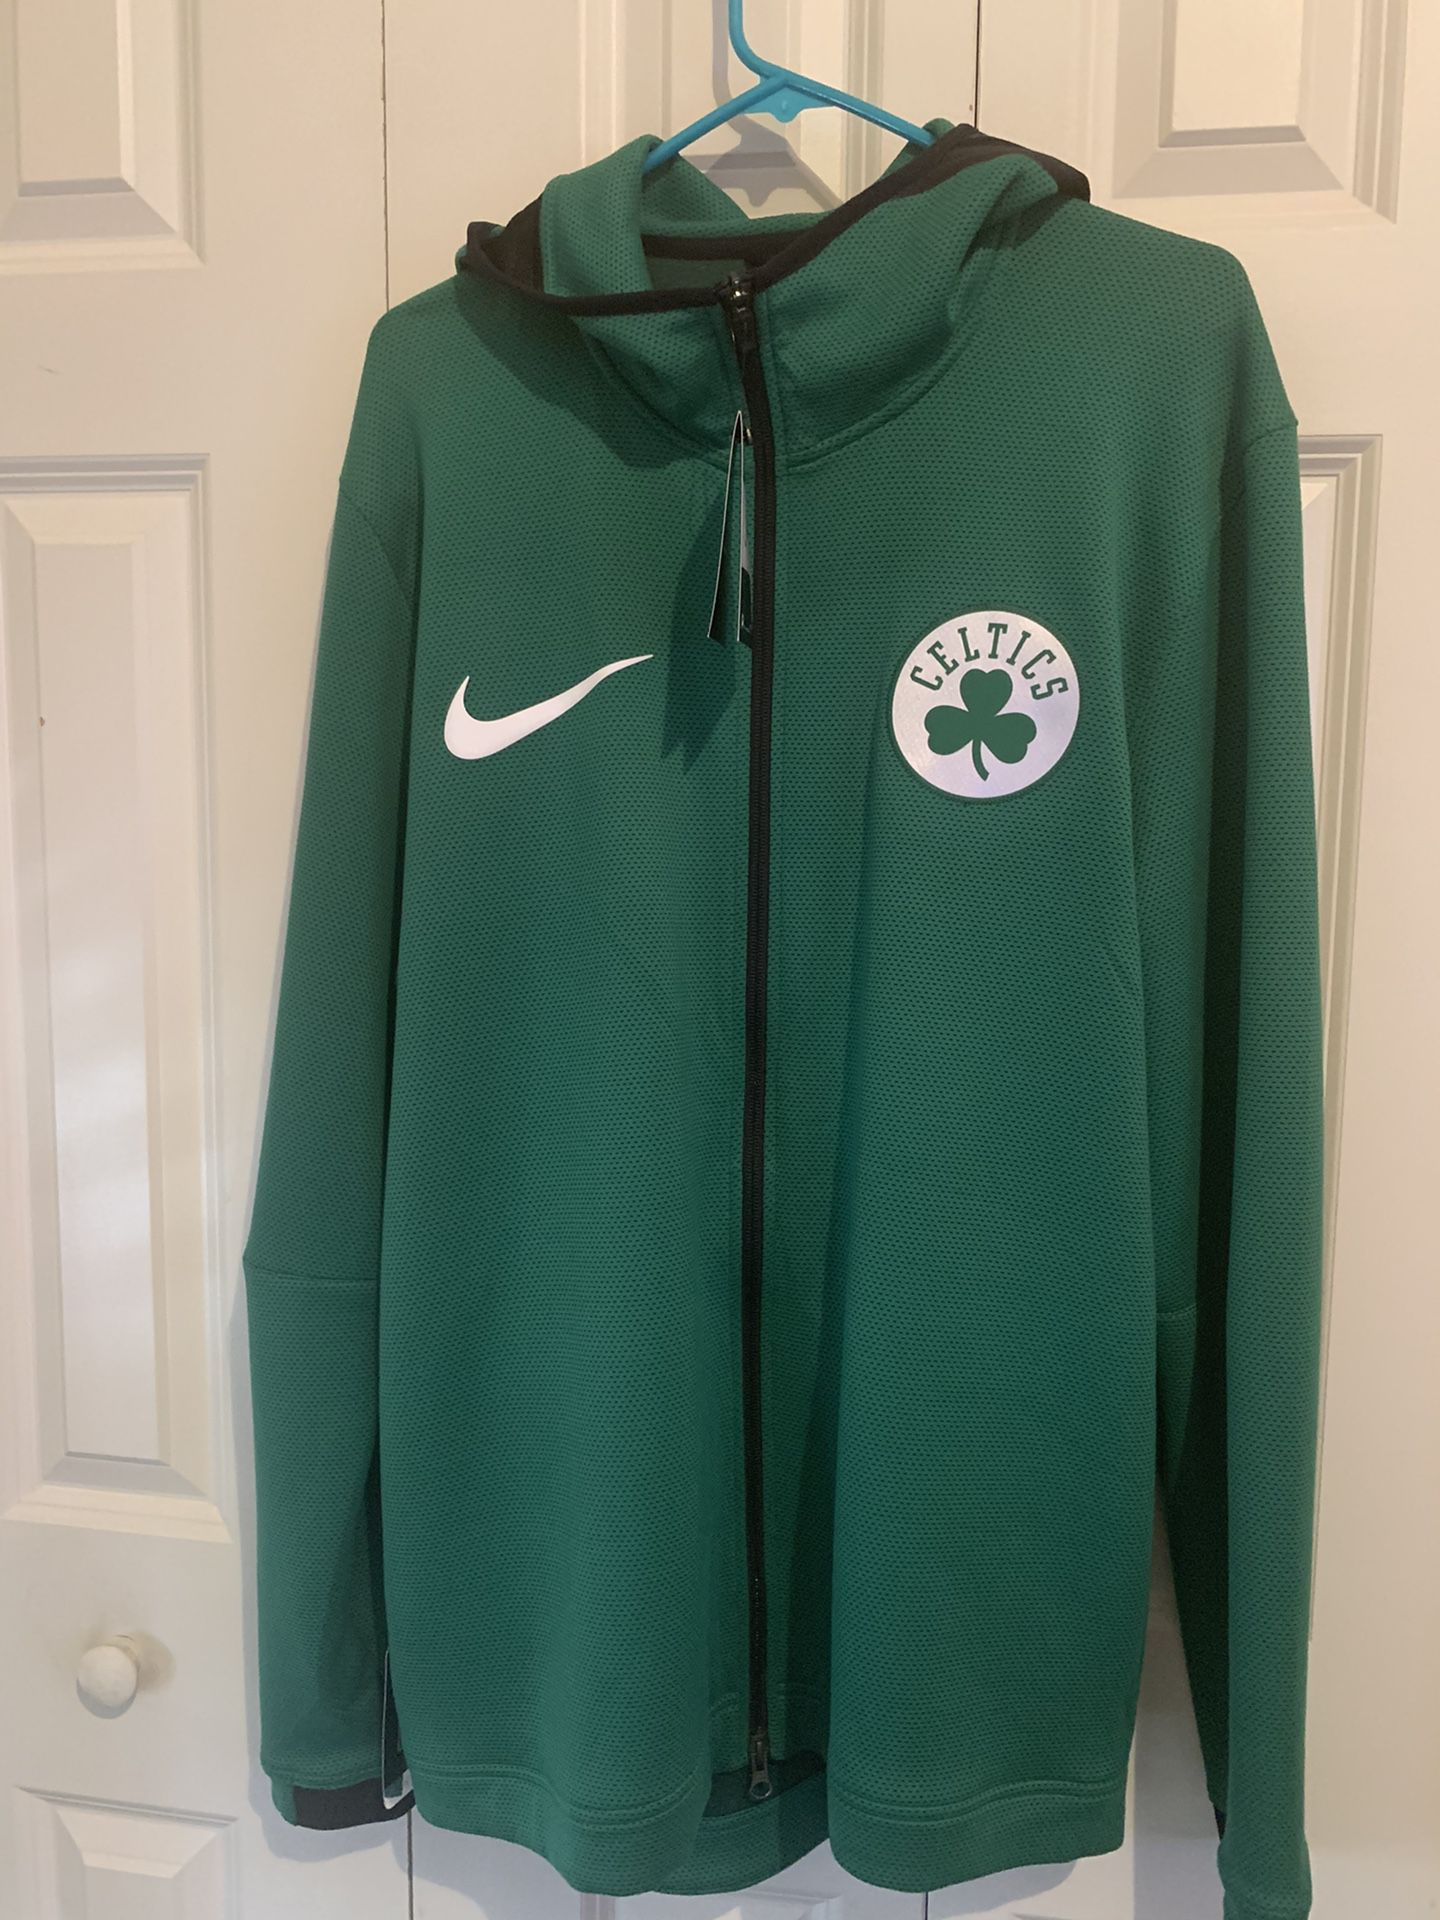 Nike Celtics Warm Up Hoodie (XL)